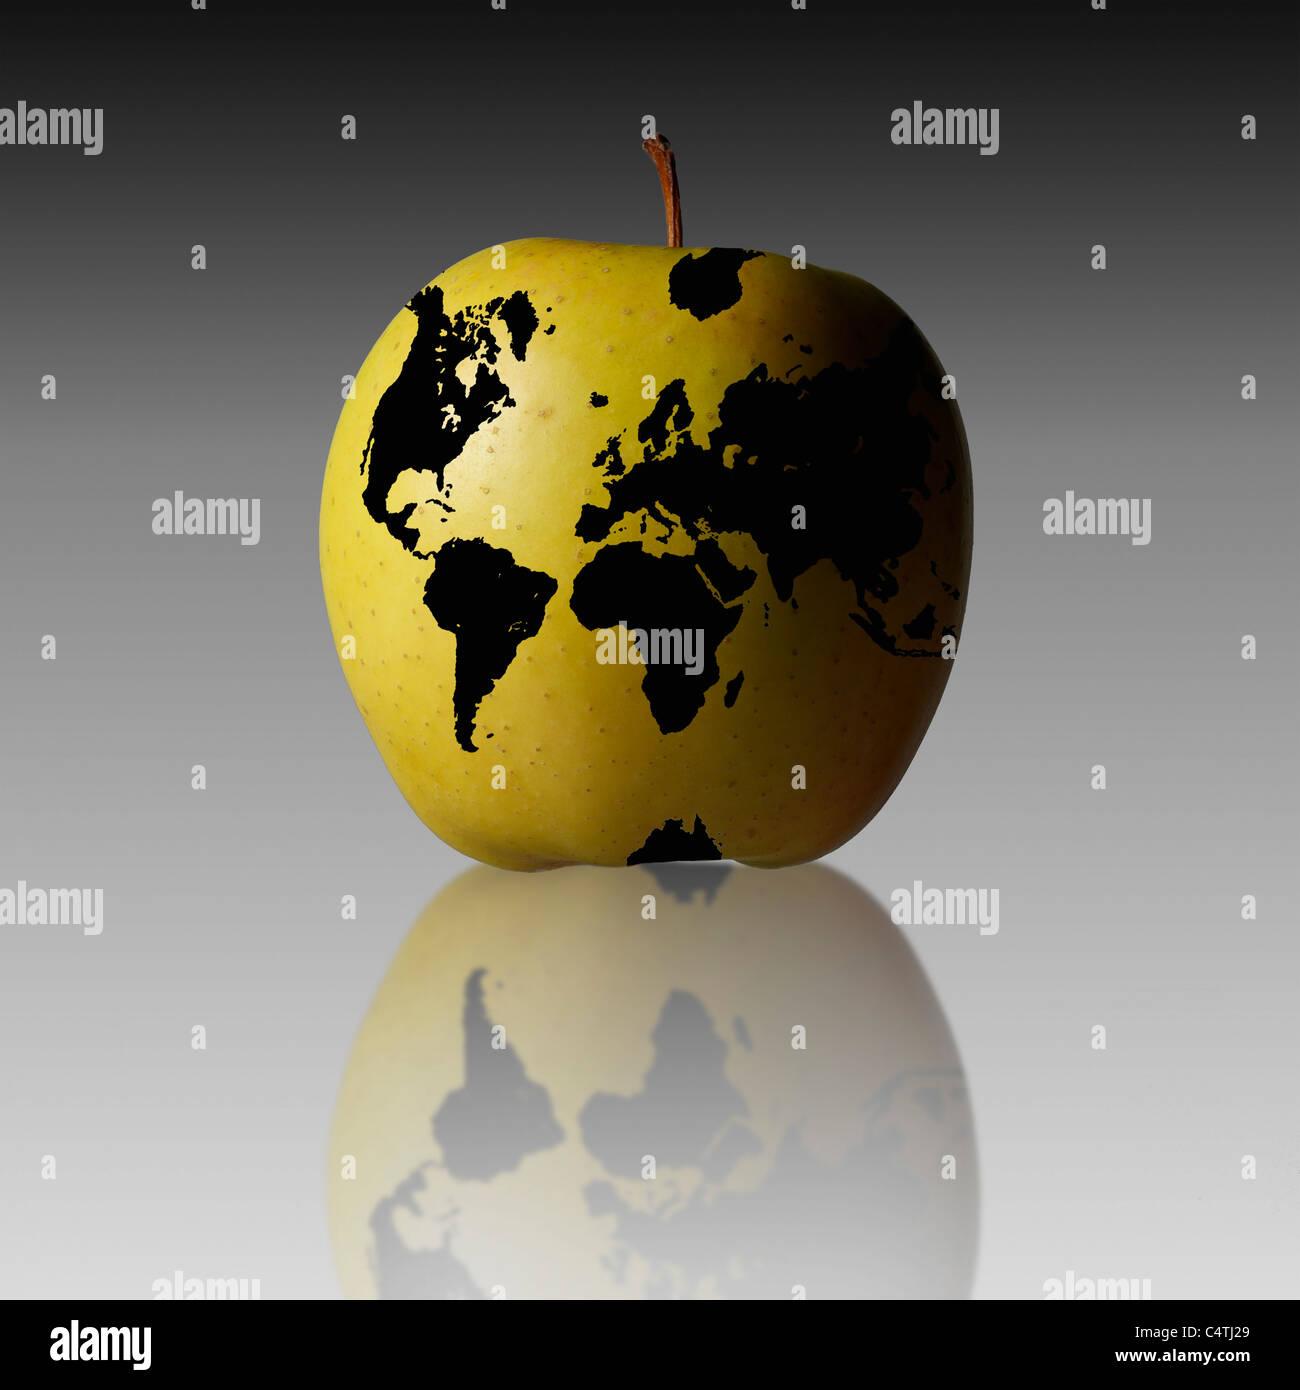 World map on apple - Stock Image